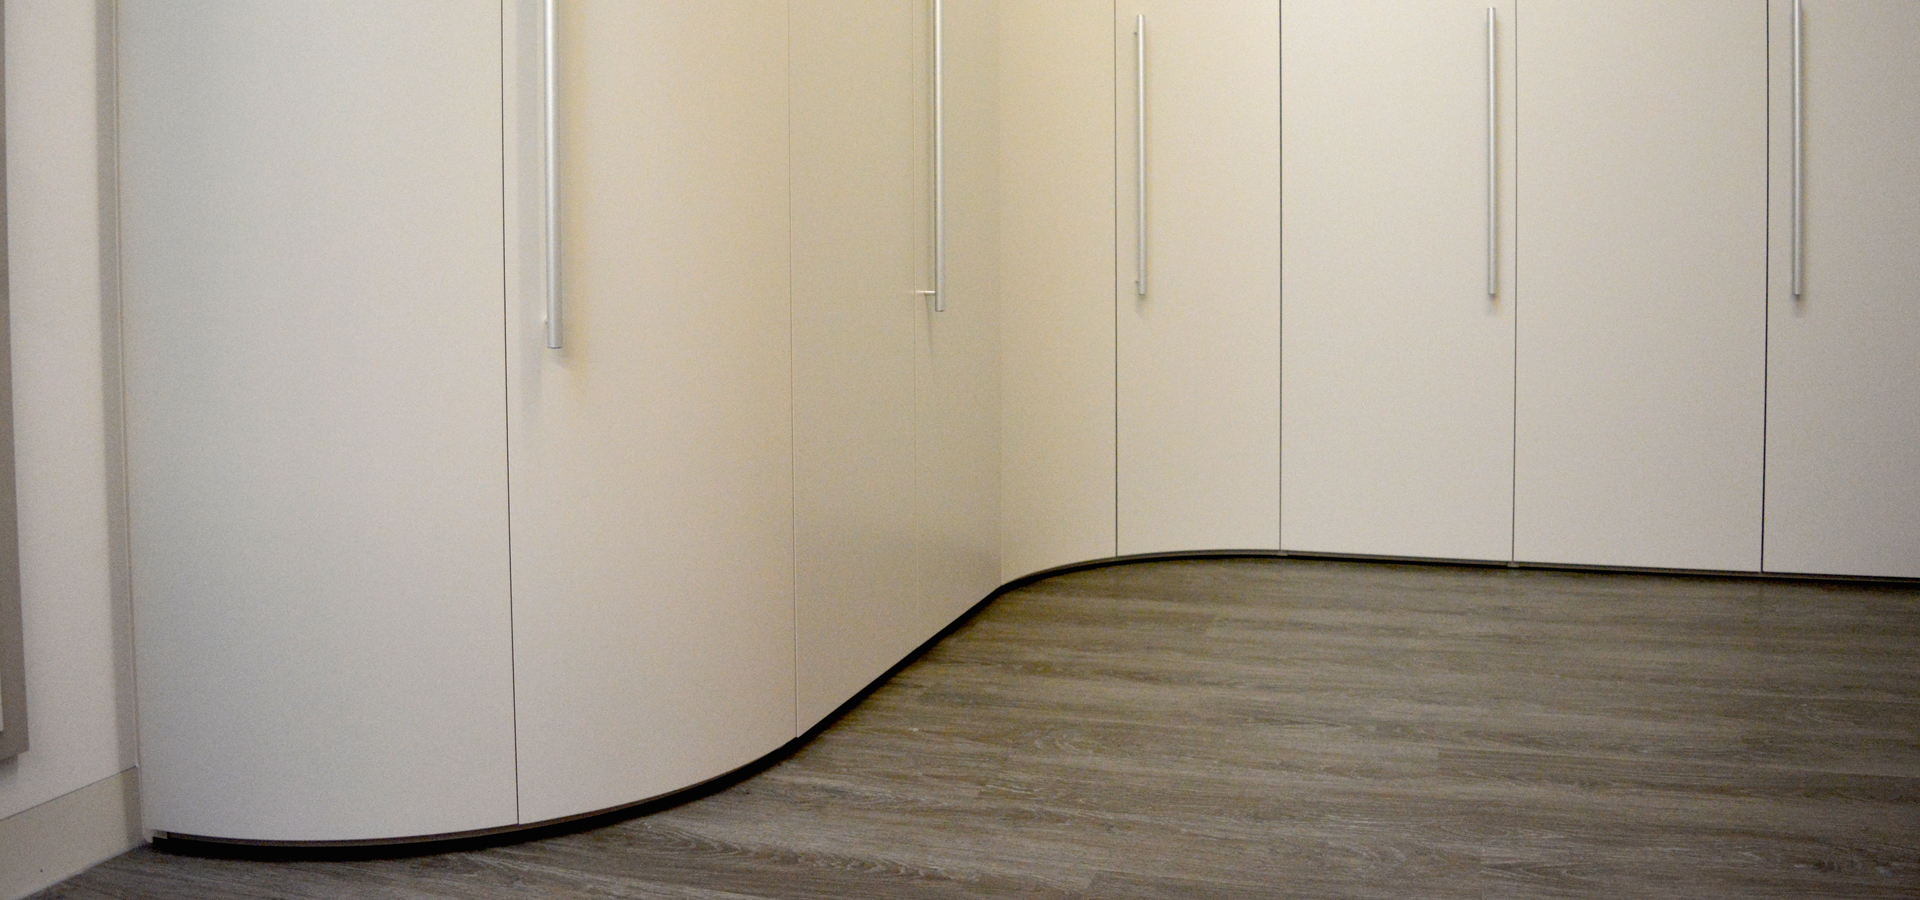 Curved wardrobe dove grey